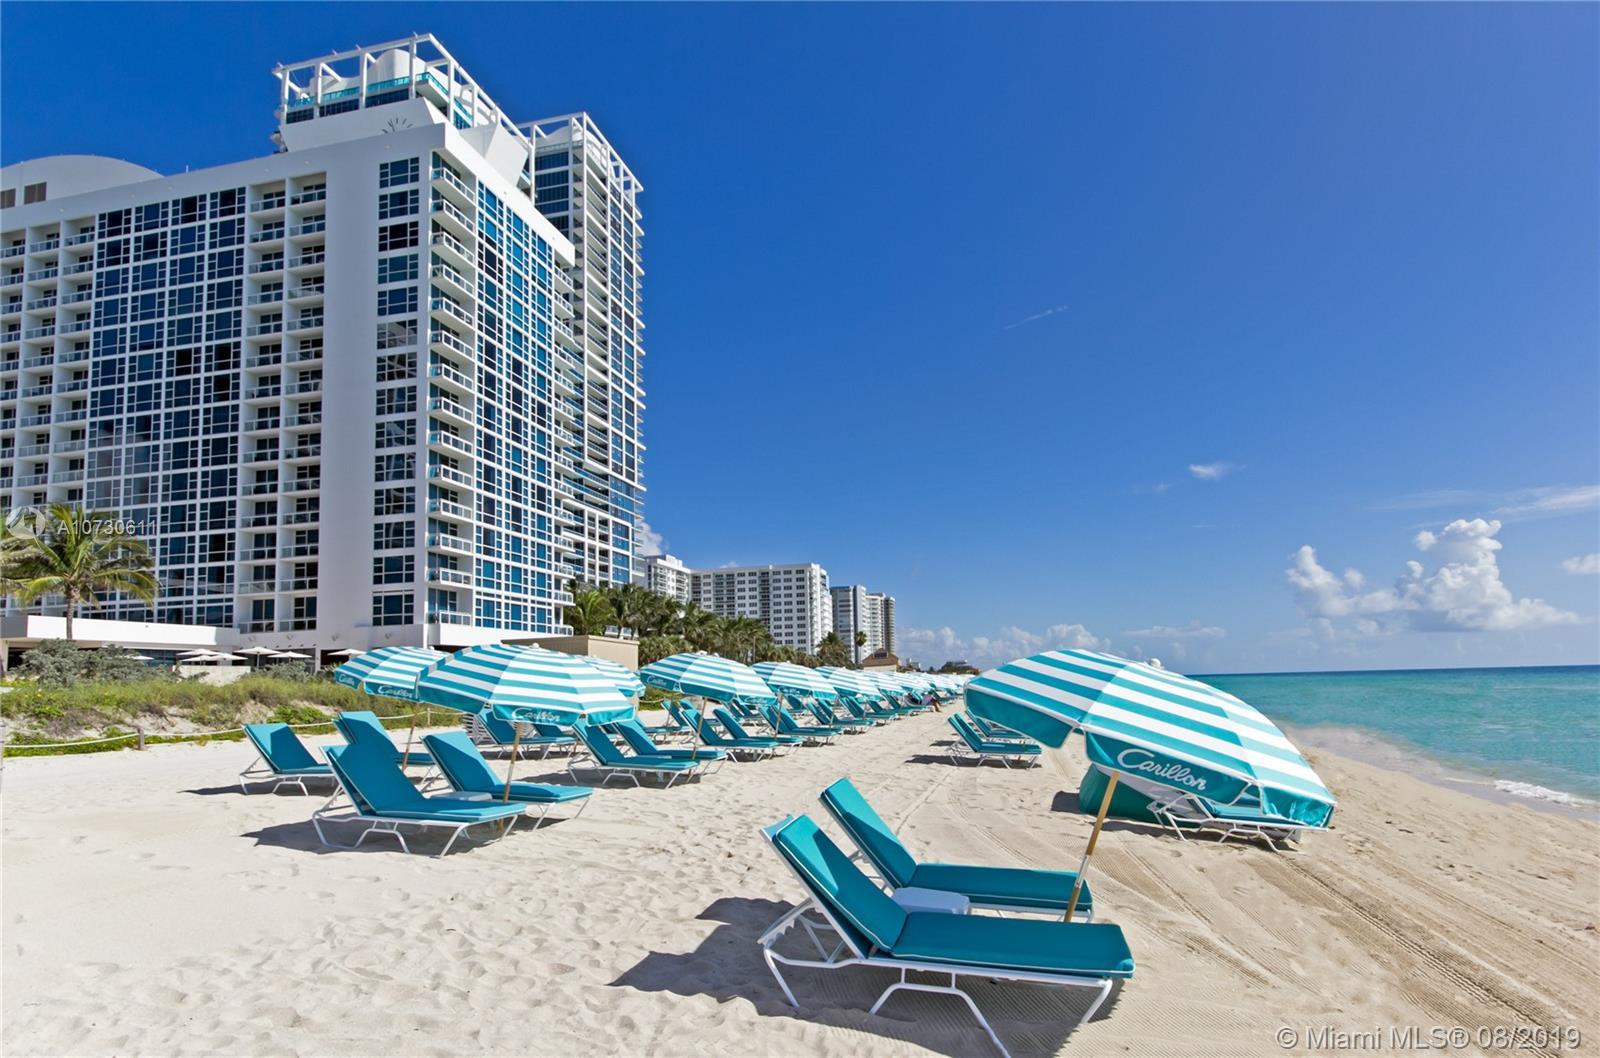 6899 Collins Ave, 1210 - Miami Beach, Florida